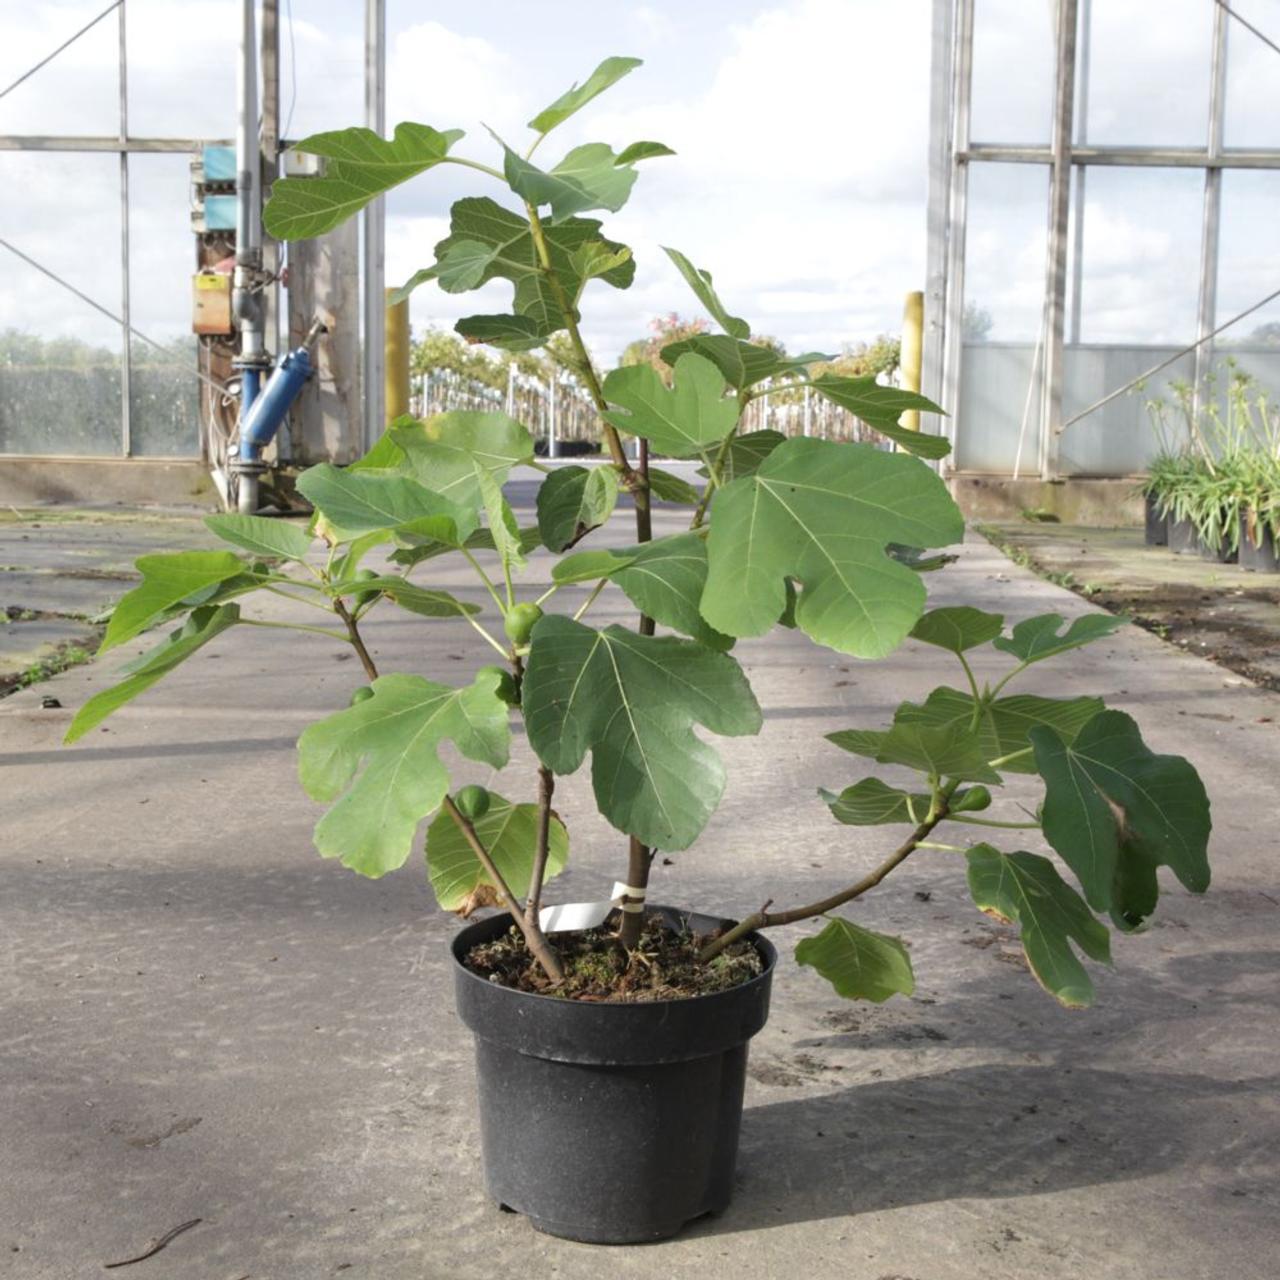 Ficus carica 'Kadota' plant